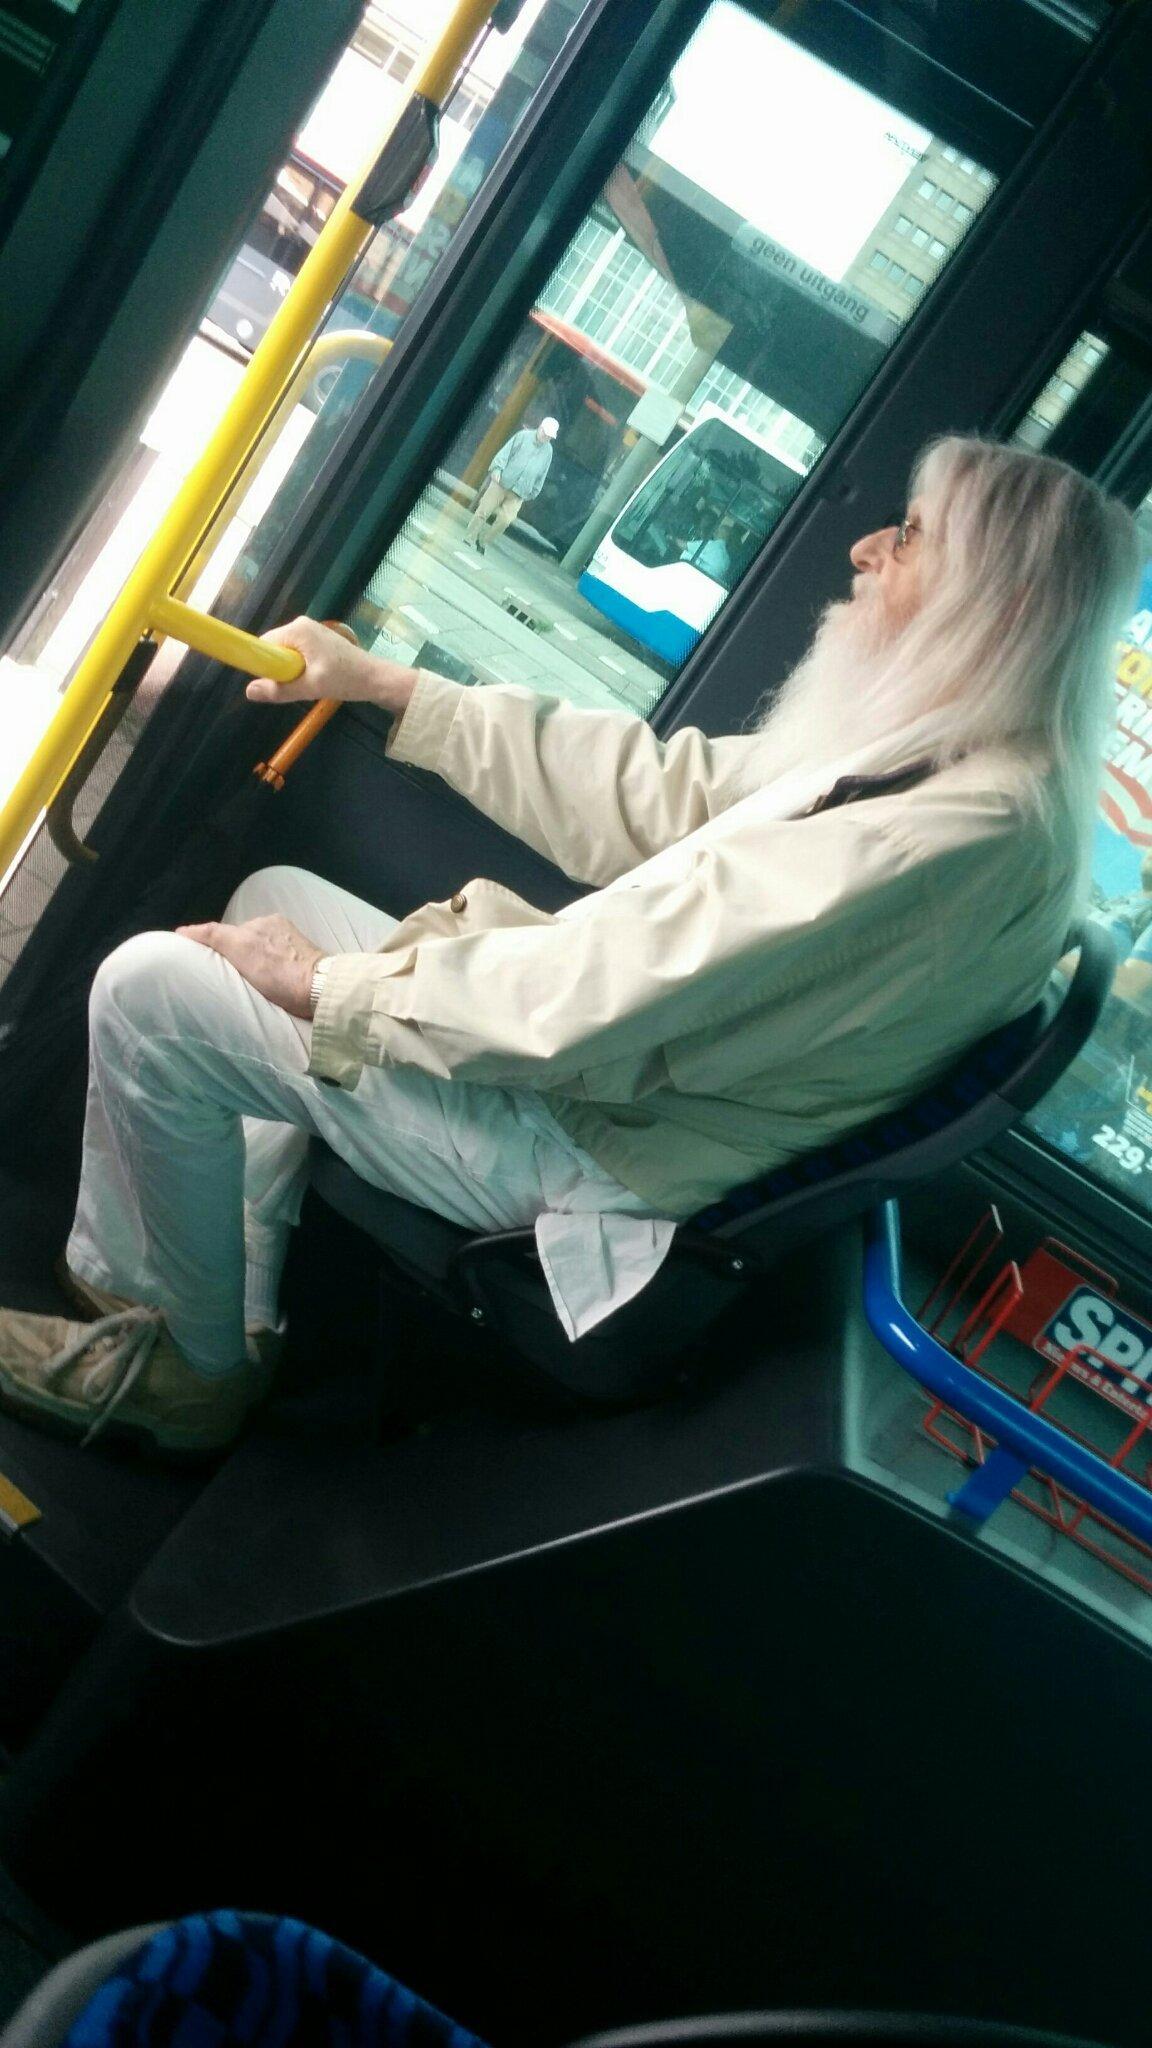 Gandalf went by bus - meme